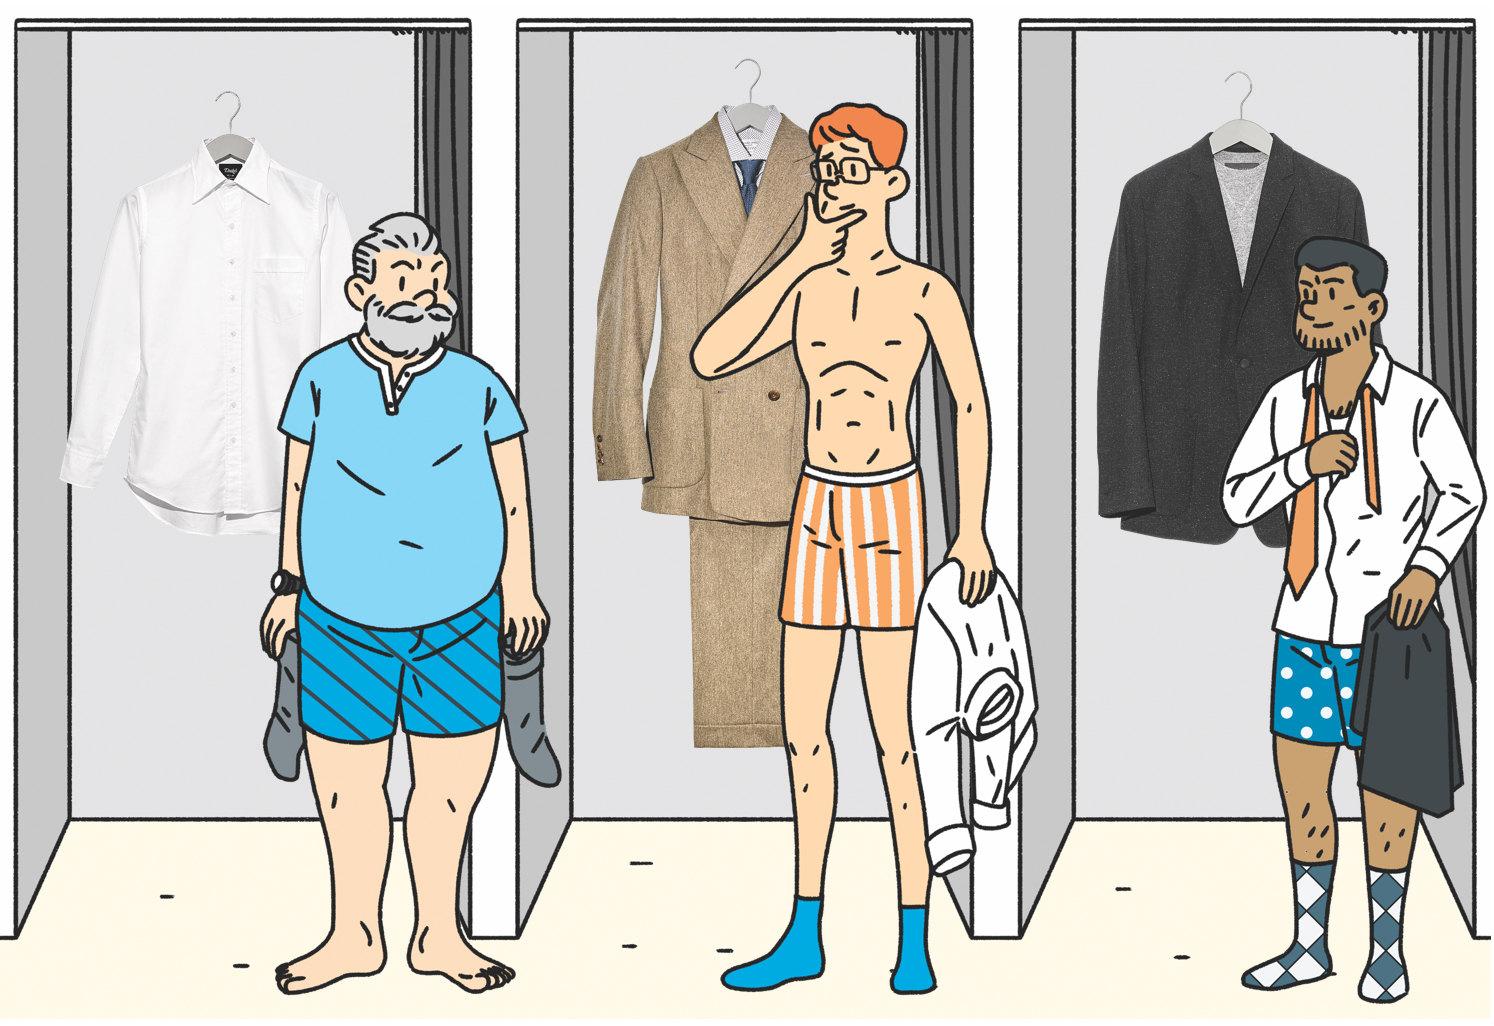 4. Костюм, рубашка, все Richard James, галстук Huntsman  5. Пиджак Kilgour, свитшот Thom Sweeney  6. Костюм, рубашка, галстук, все Daks